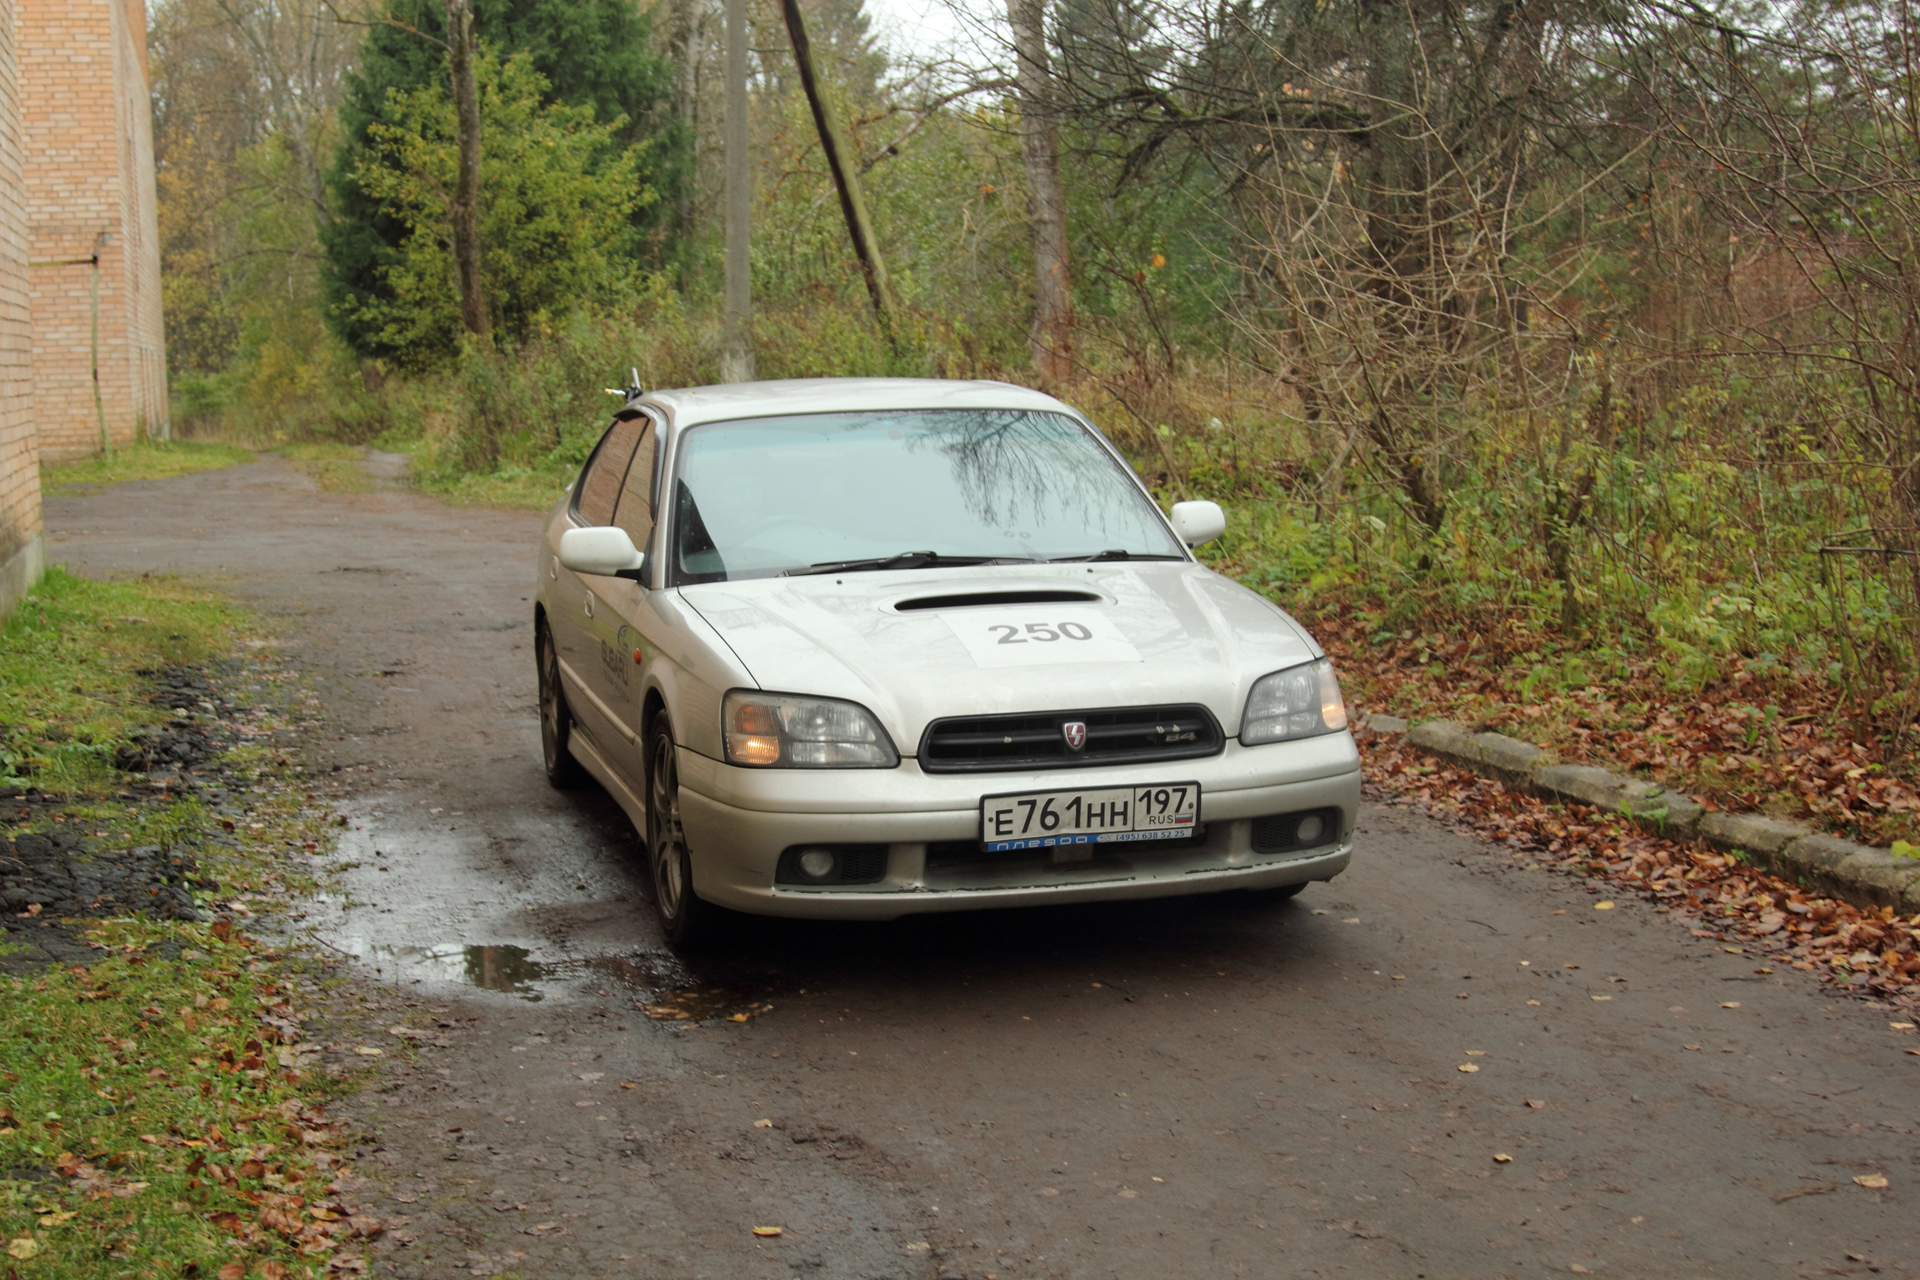 ISEA autoclubman 569